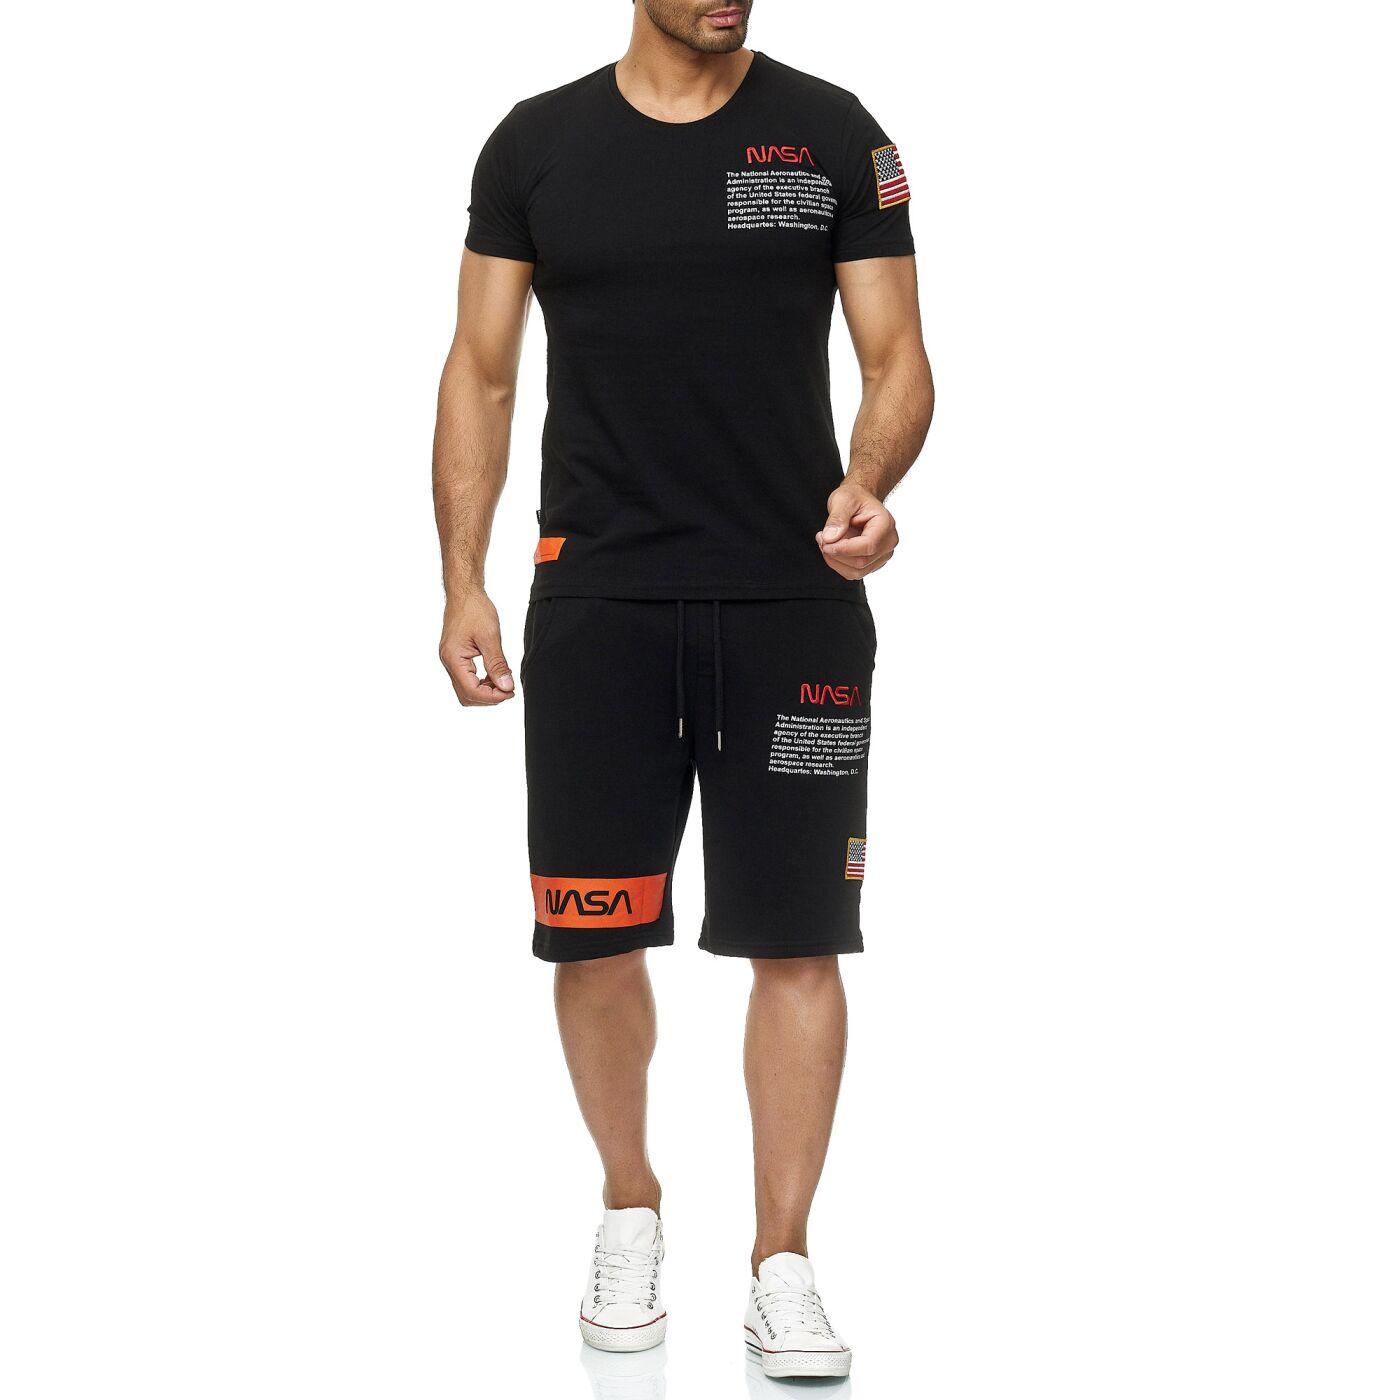 398385d9e83608 Red Bridge Herren T-Shirt und Shorts Jogginganzug Kurze Hose Set Sweat  Pants NASA Logo